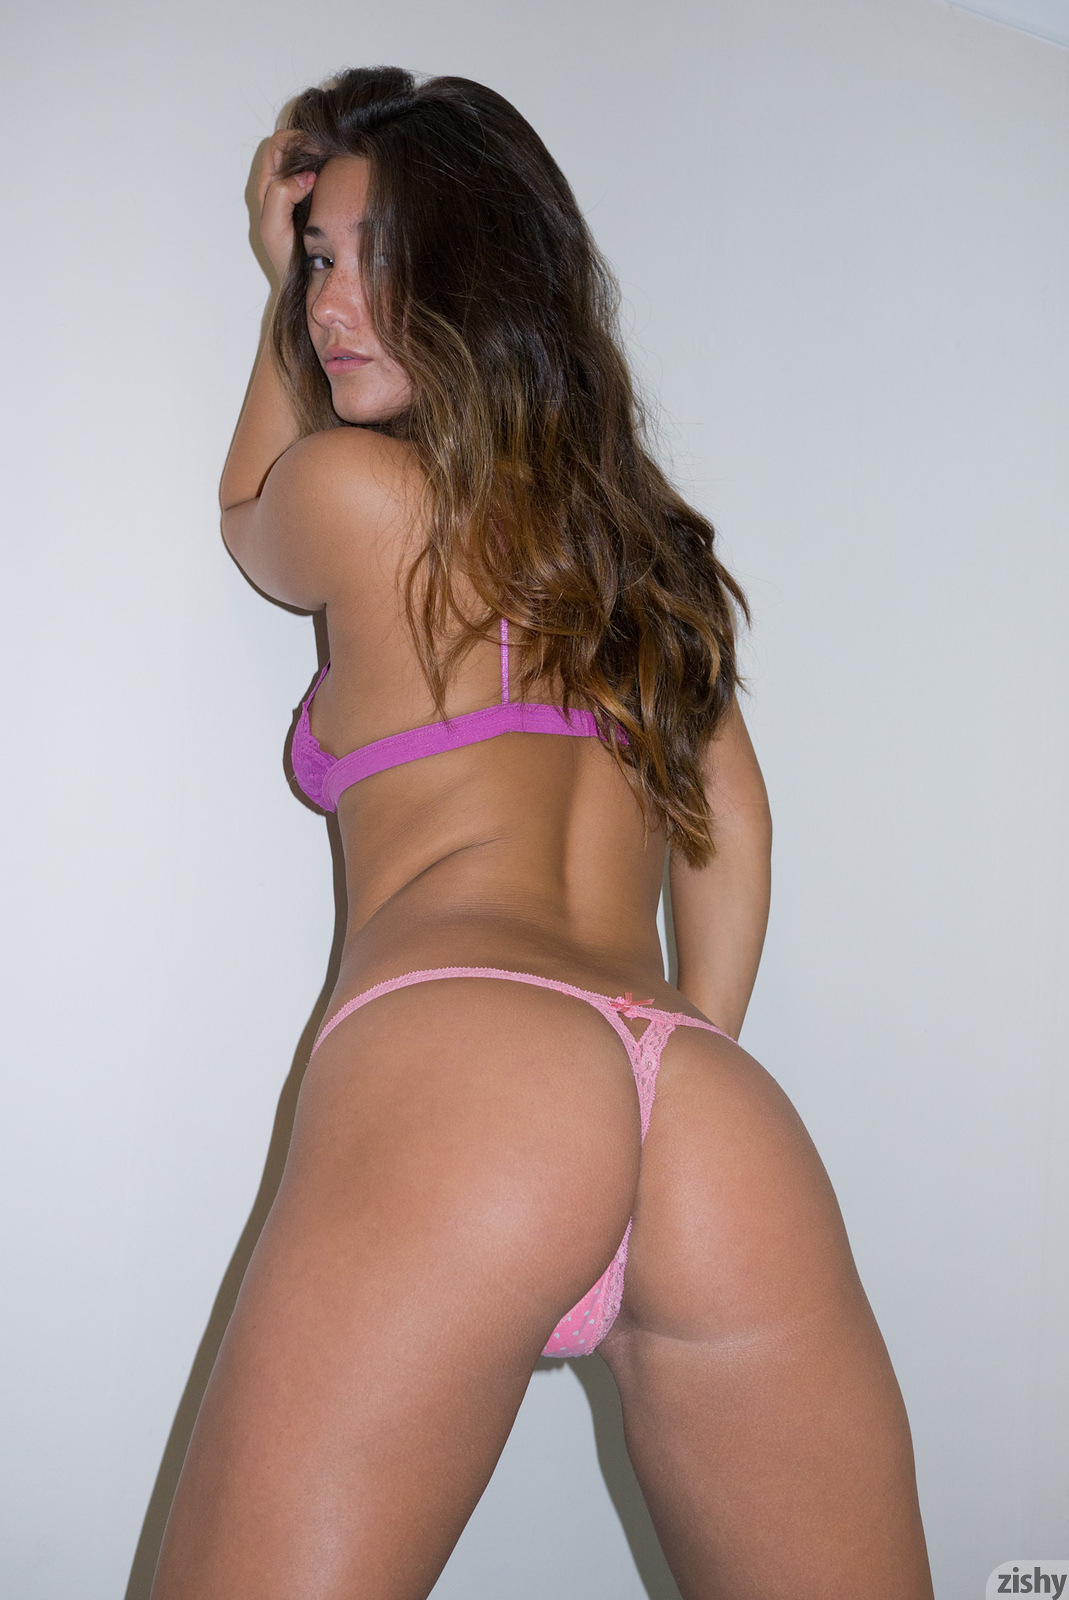 prostitutas de un burdel putas anal